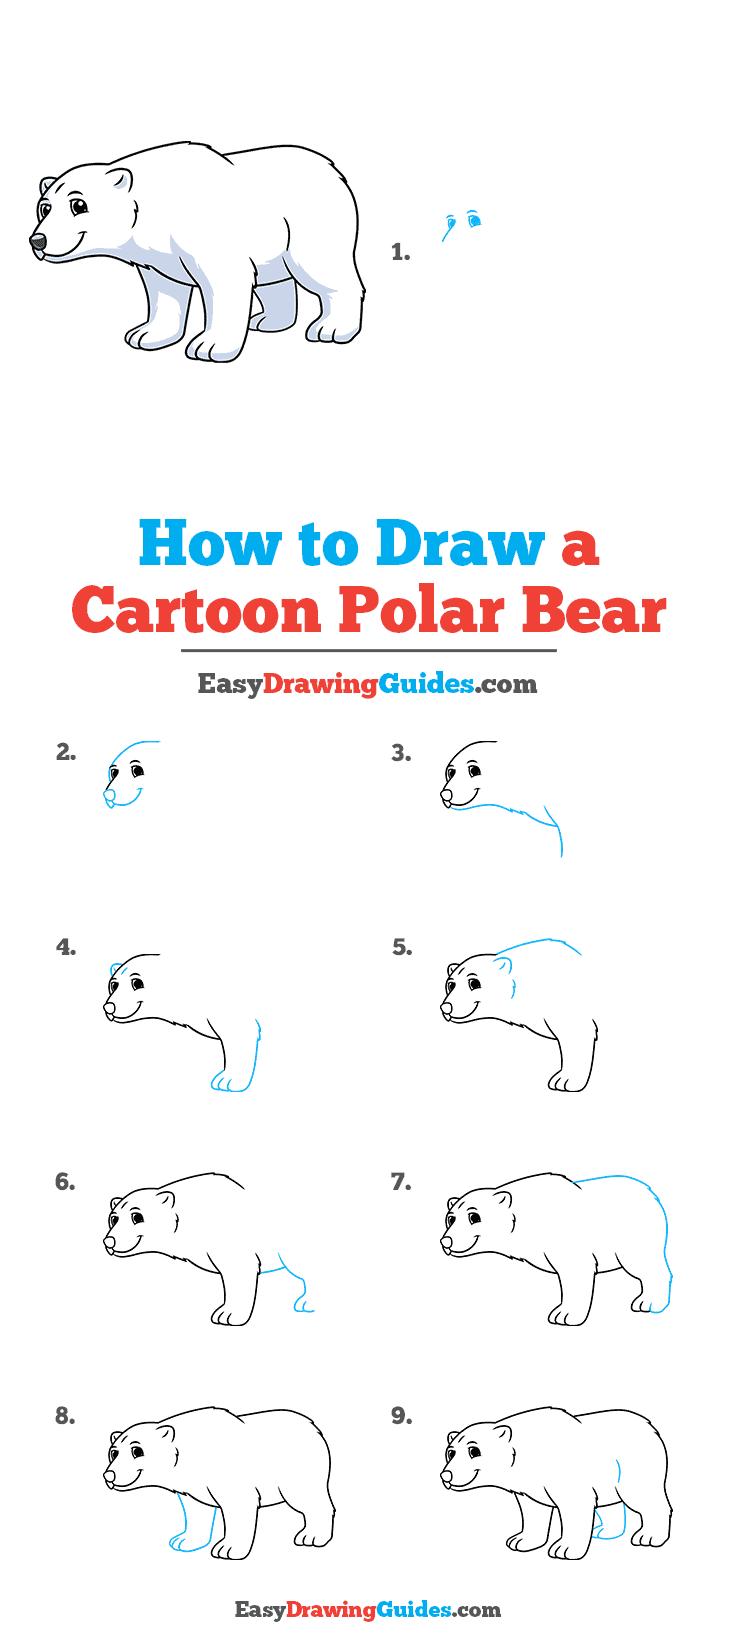 How to Draw a Cartoon Polar Bear Step by Step Tutorial Image